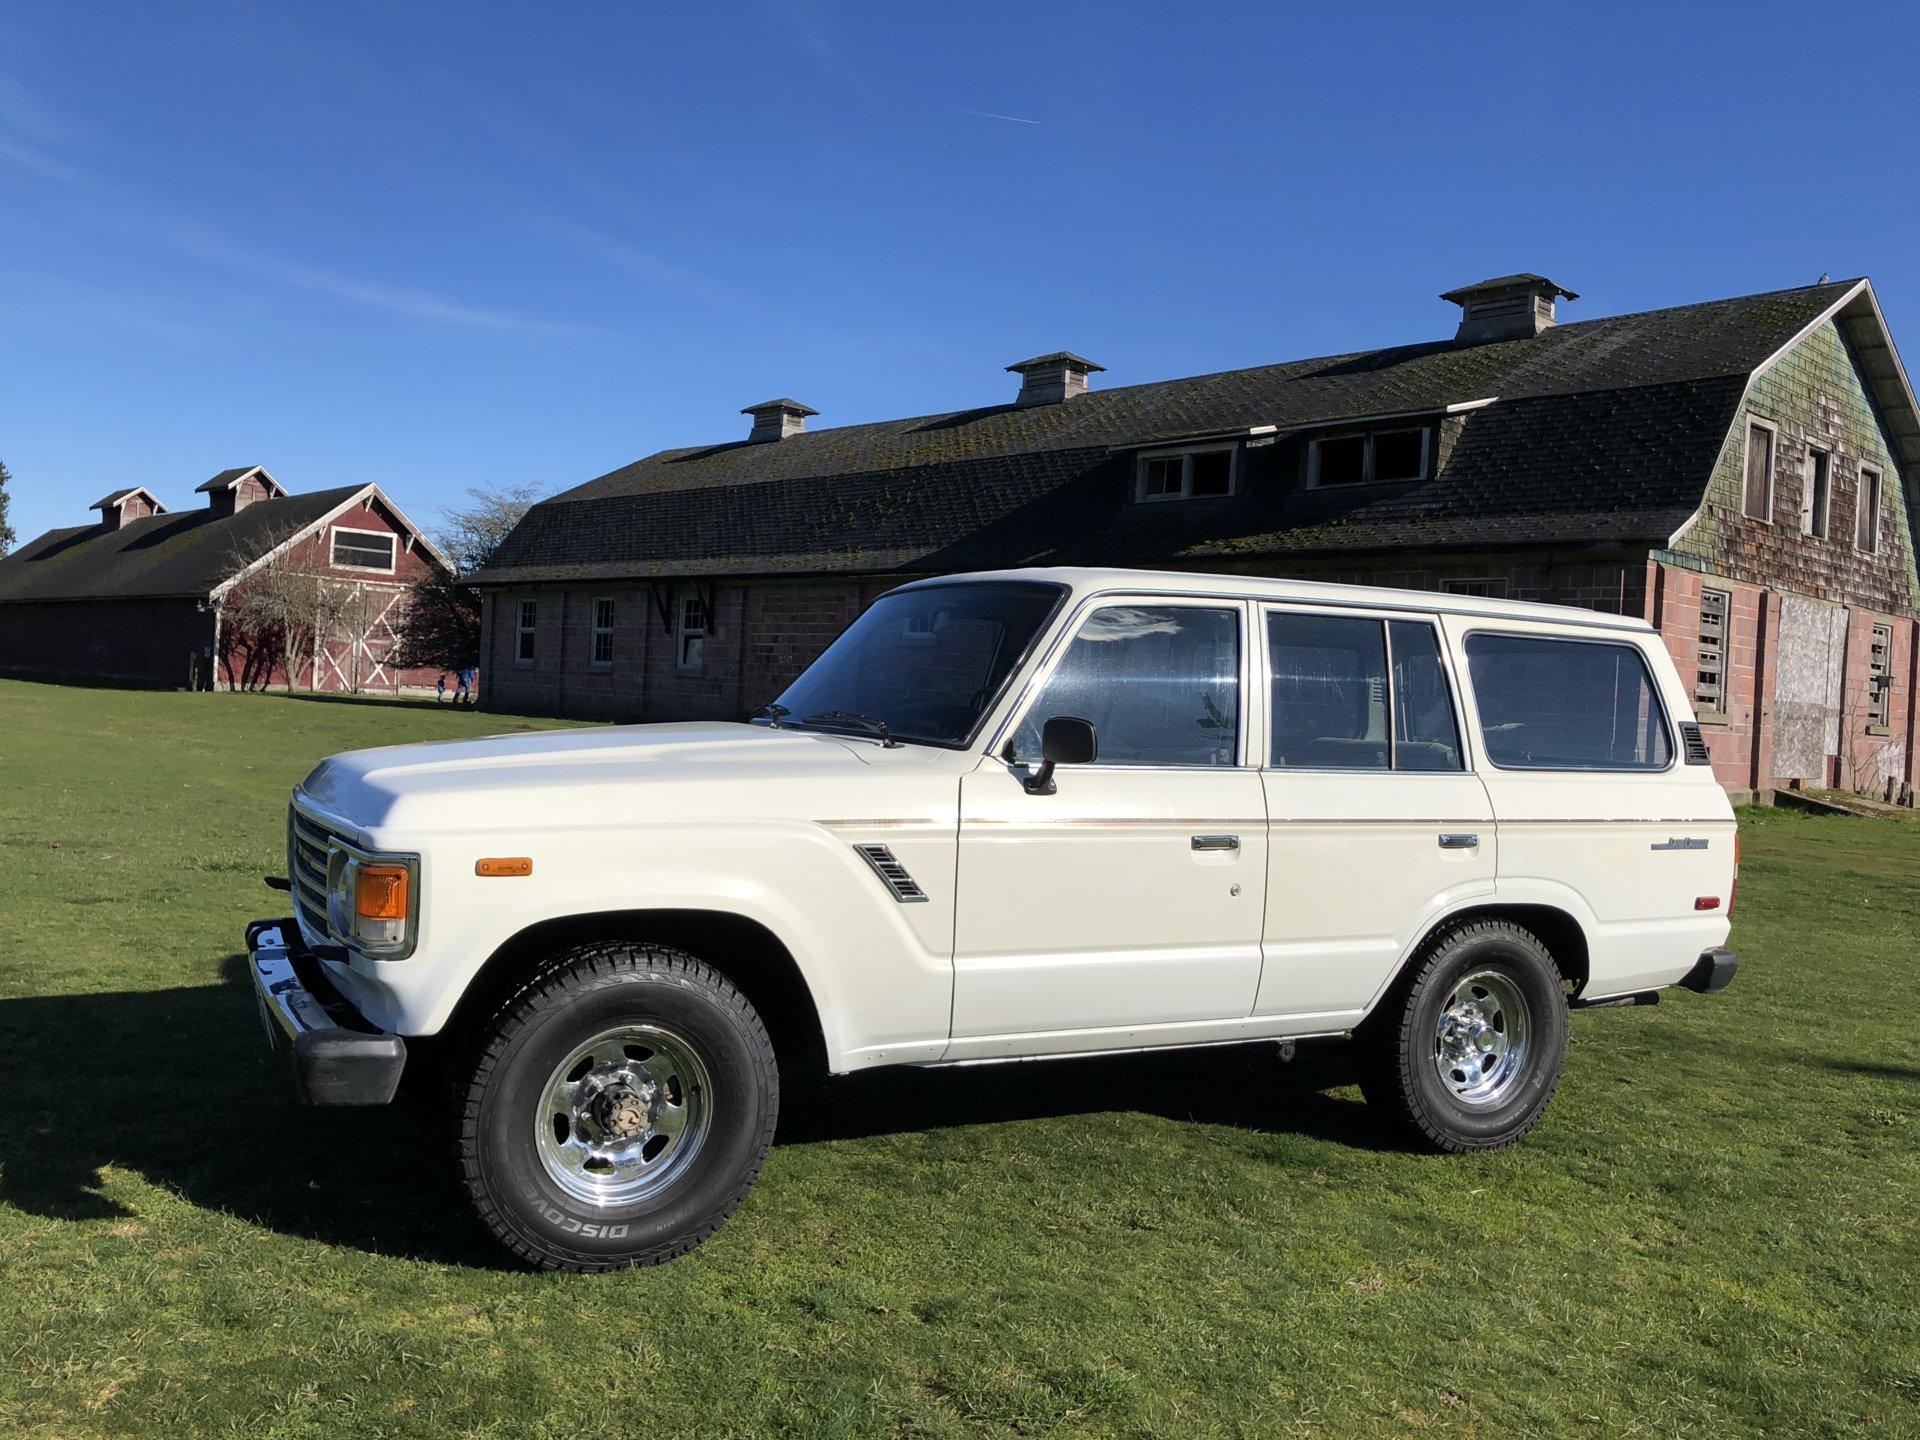 For Sale 1984 Toyota Land Cruiser Fj60 Ih8mud Forum F734c4ed C4b9 4fd9 8ea3 27df05f10d0fjpeg